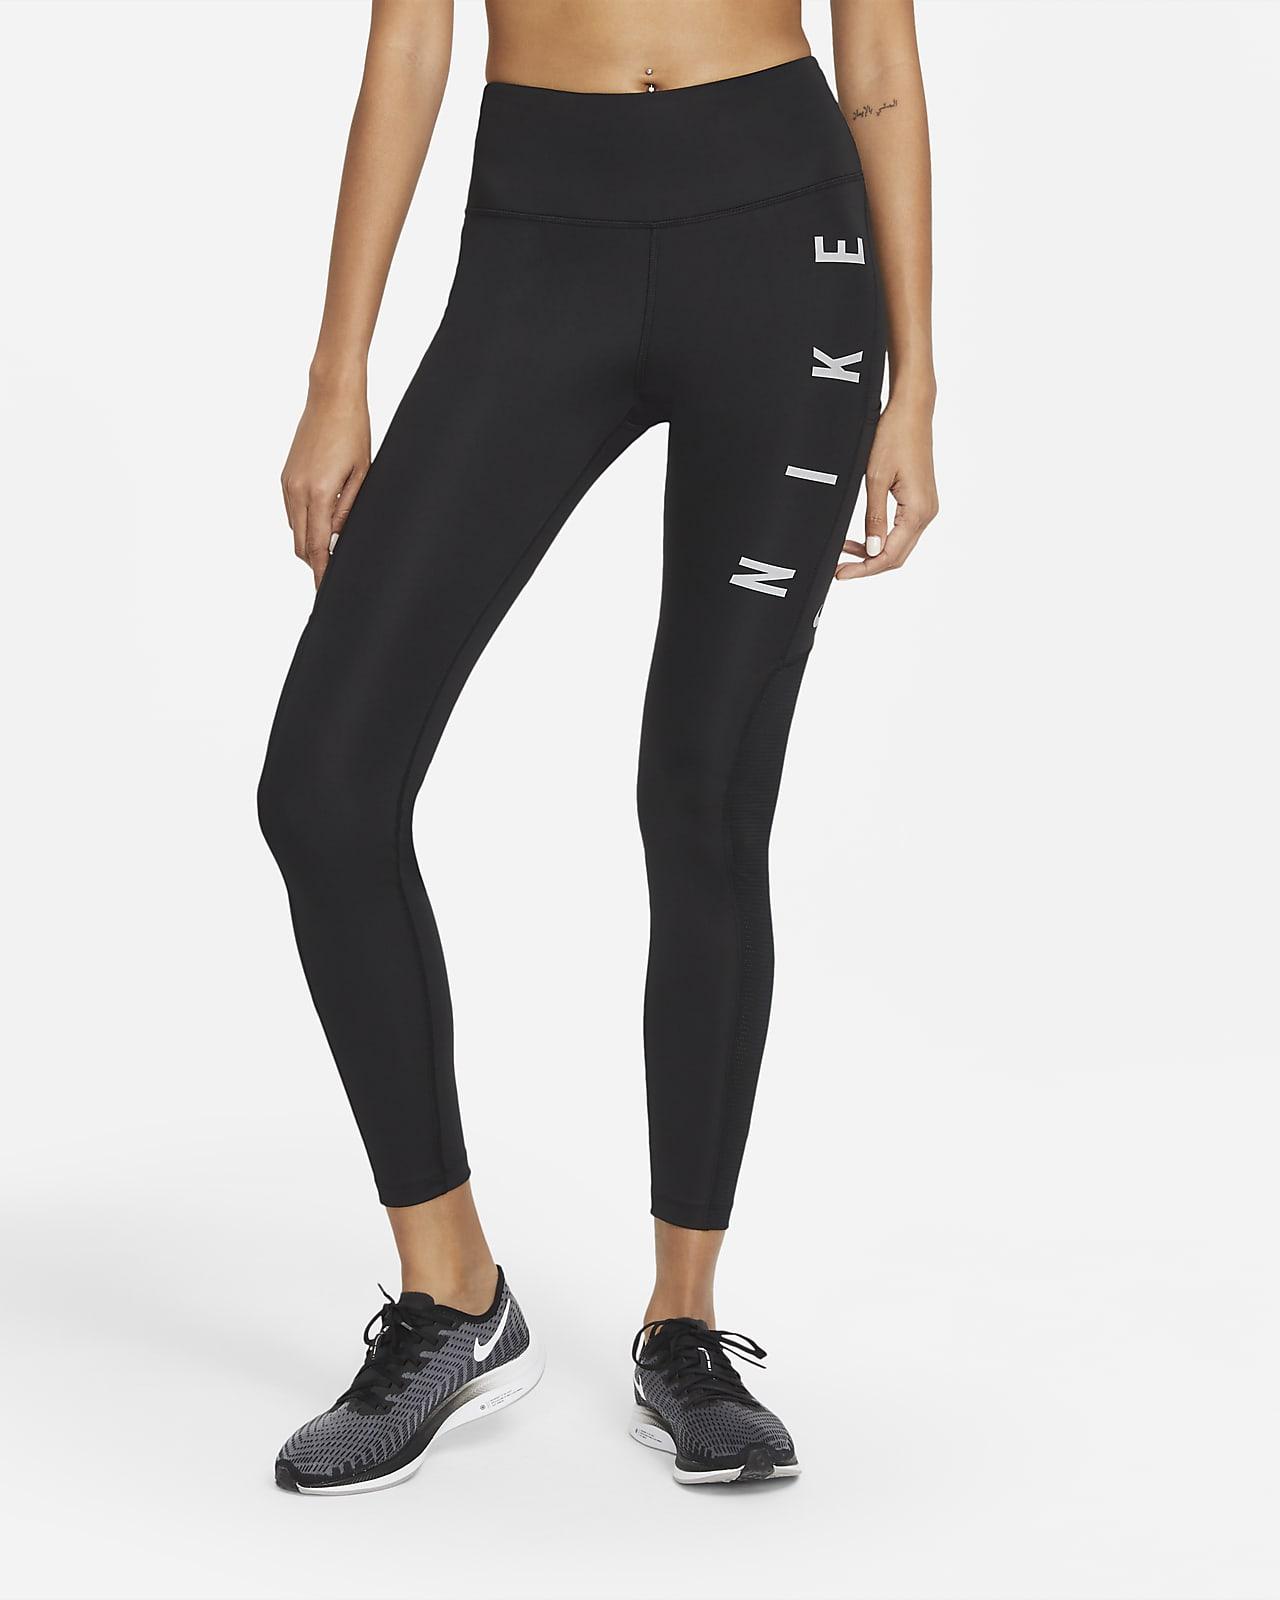 Mallas de running para mujer Nike Epic Fast Run Division